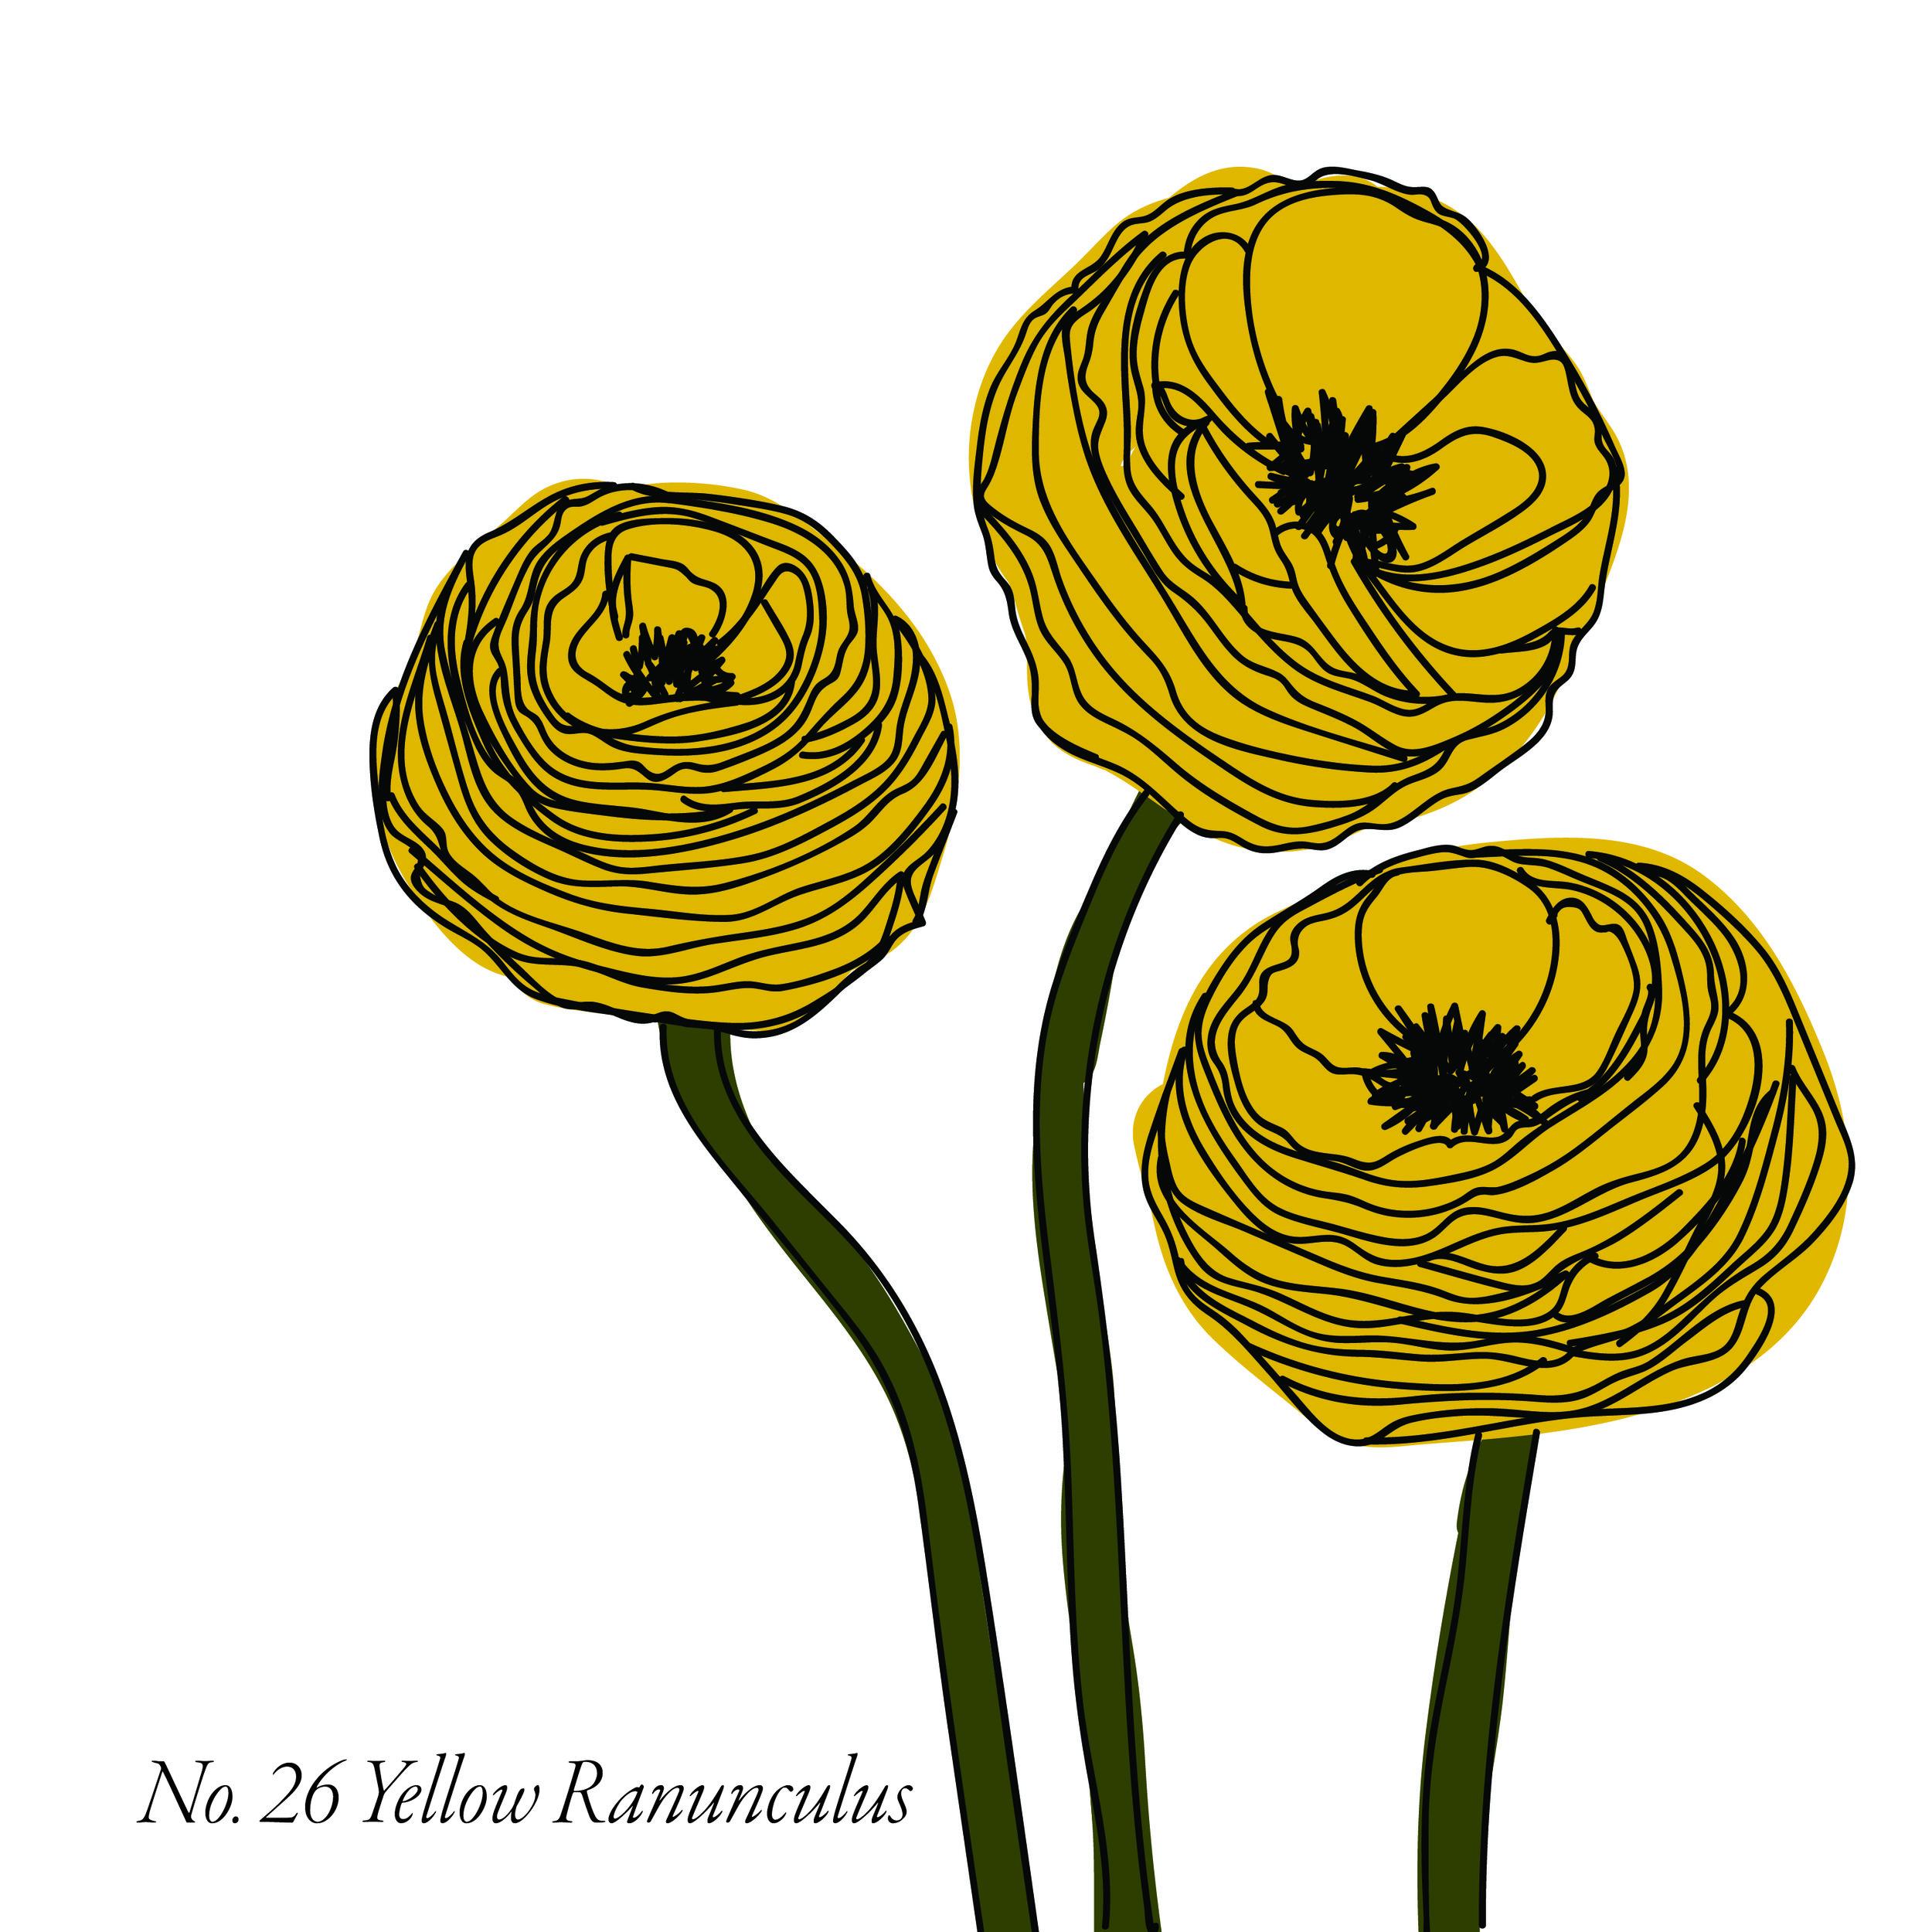 YellowRanunculus-27.jpg